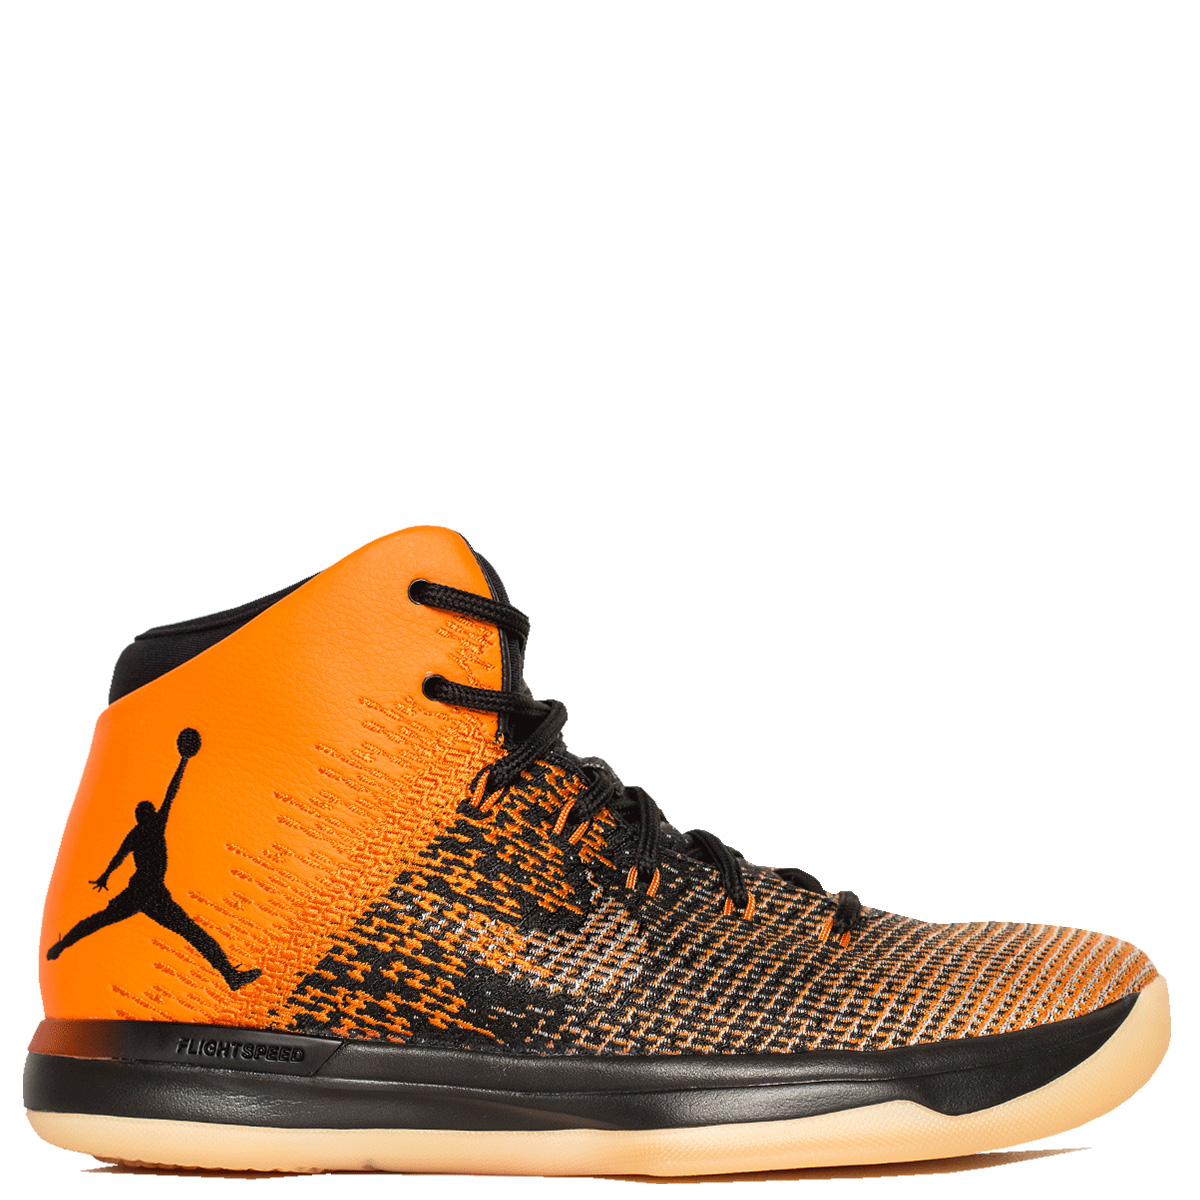 meet 39e21 8283e Nike NIKE Air Jordan 31 sneakers men AIR JORDAN 31 SHATTERED BACKBOARD  orange 845,037-021